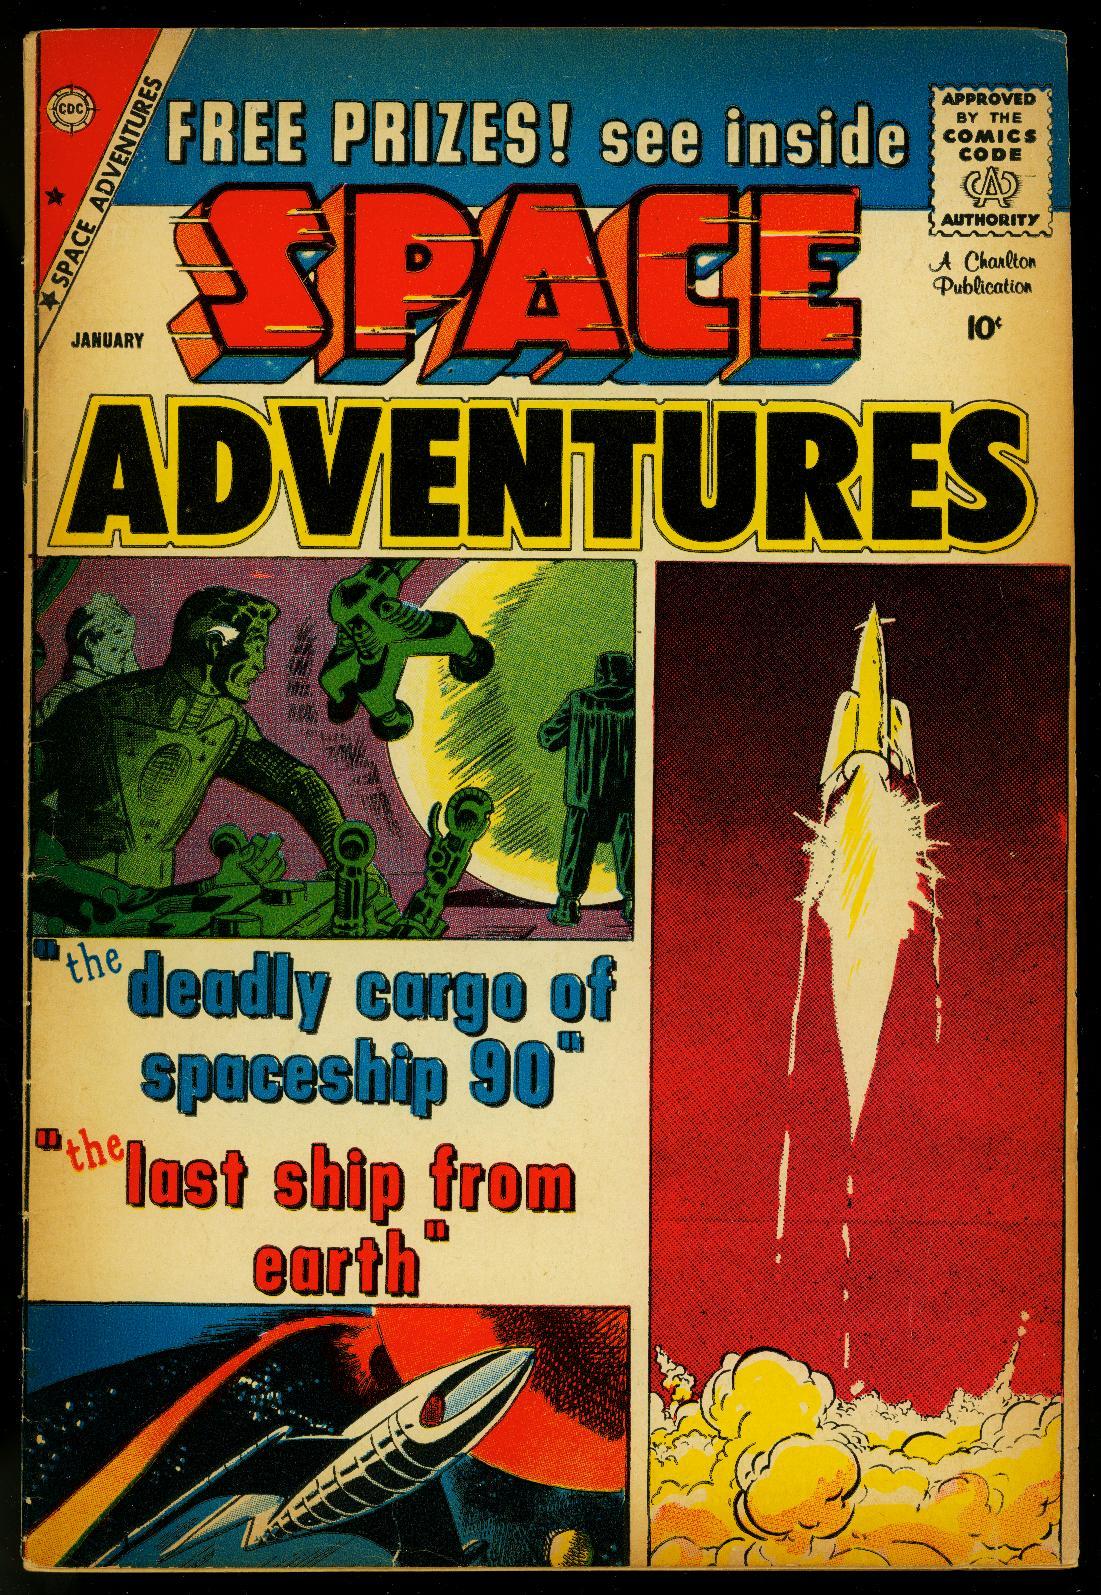 Space Adventures #32 1960- Steve Ditko - Charlton Comics- FN- Fine